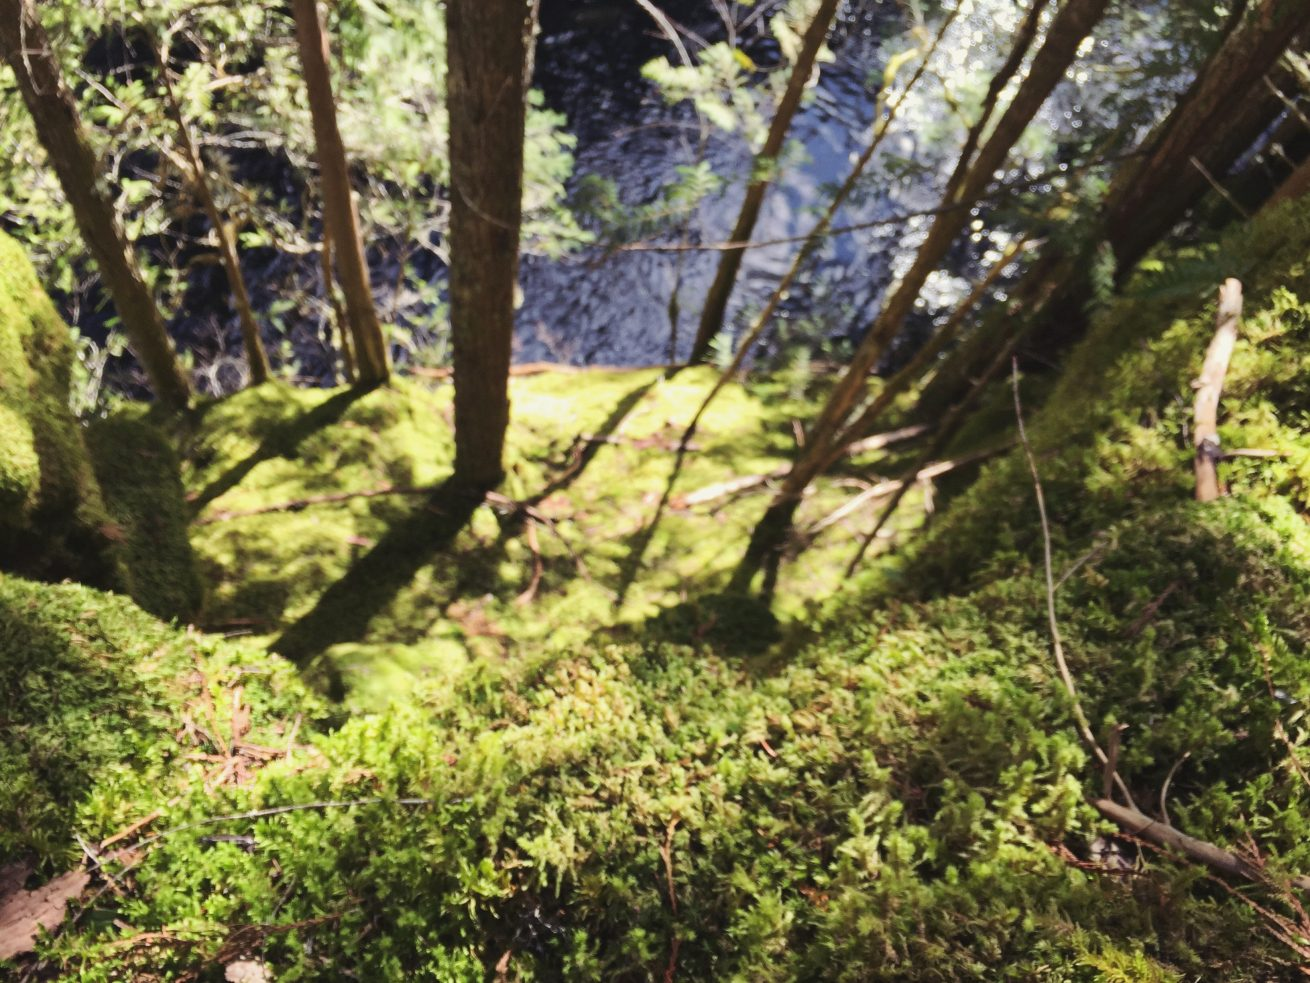 Mallory Paige explores Oregon